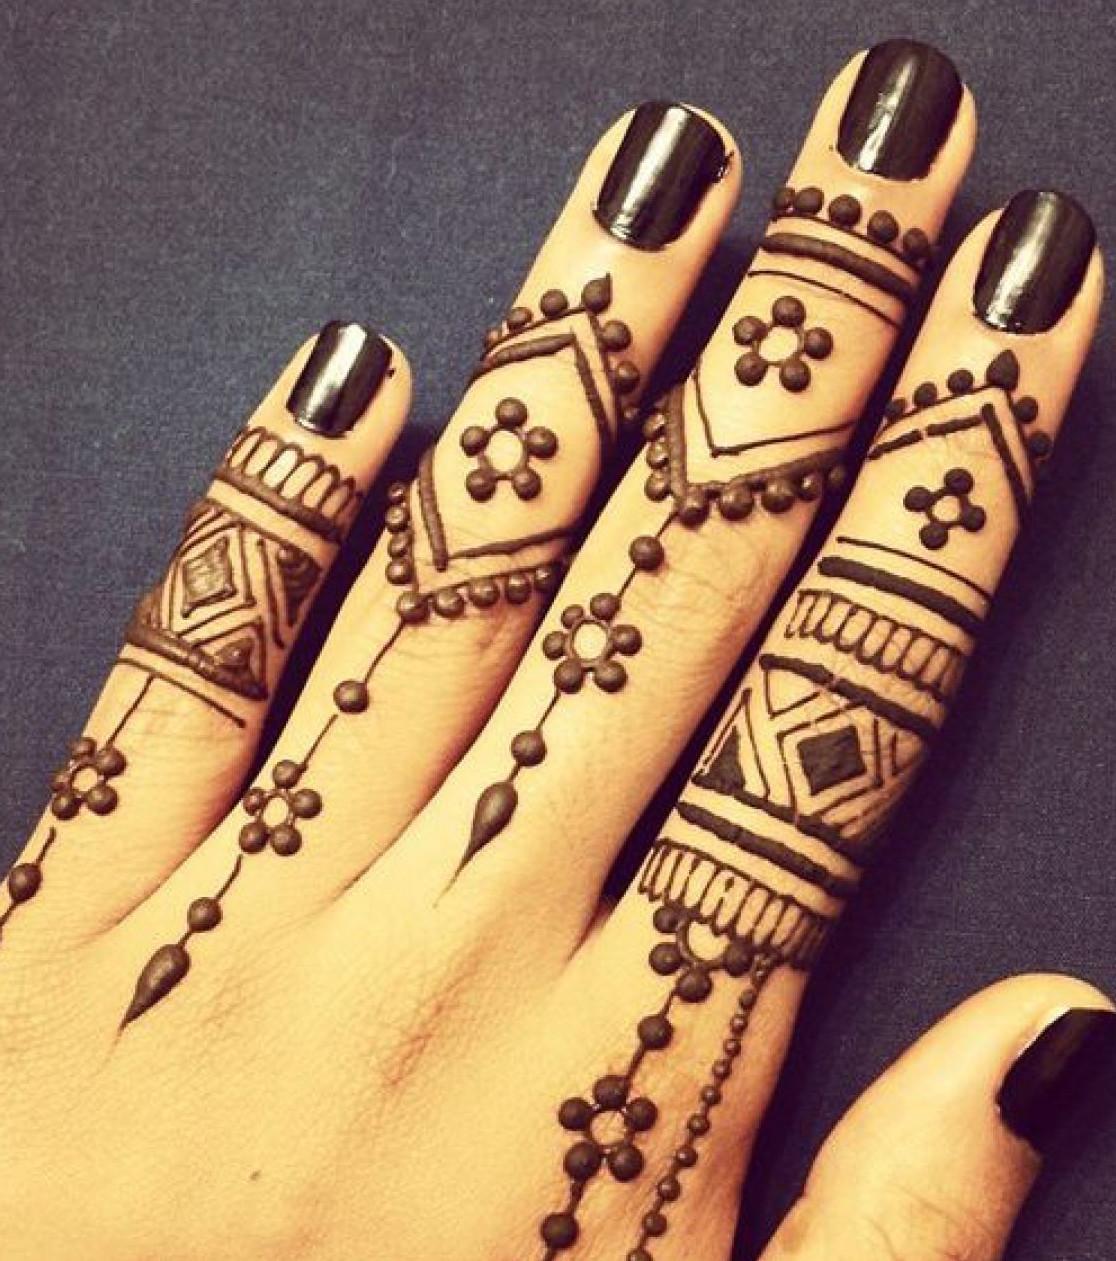 originelle tattoos 20 extrem kreative tattoo ideen zur inspiration - Henna Tattoo Muster